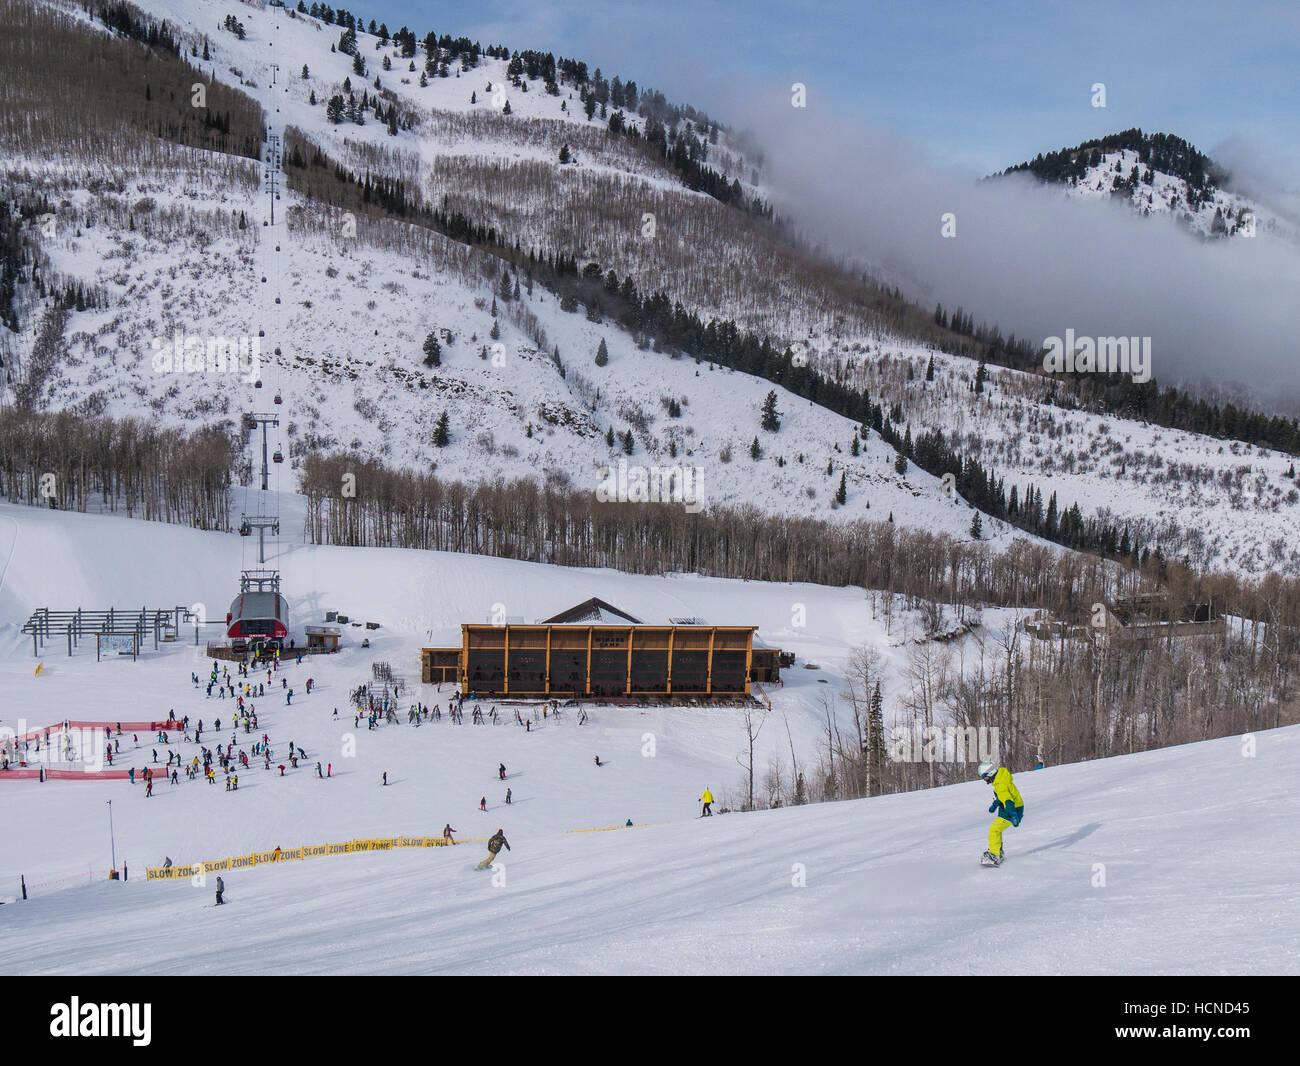 Miners Camp area and Quicksilver Gondola, Park City Mountain Resort, Park City, Utah. - Stock Image